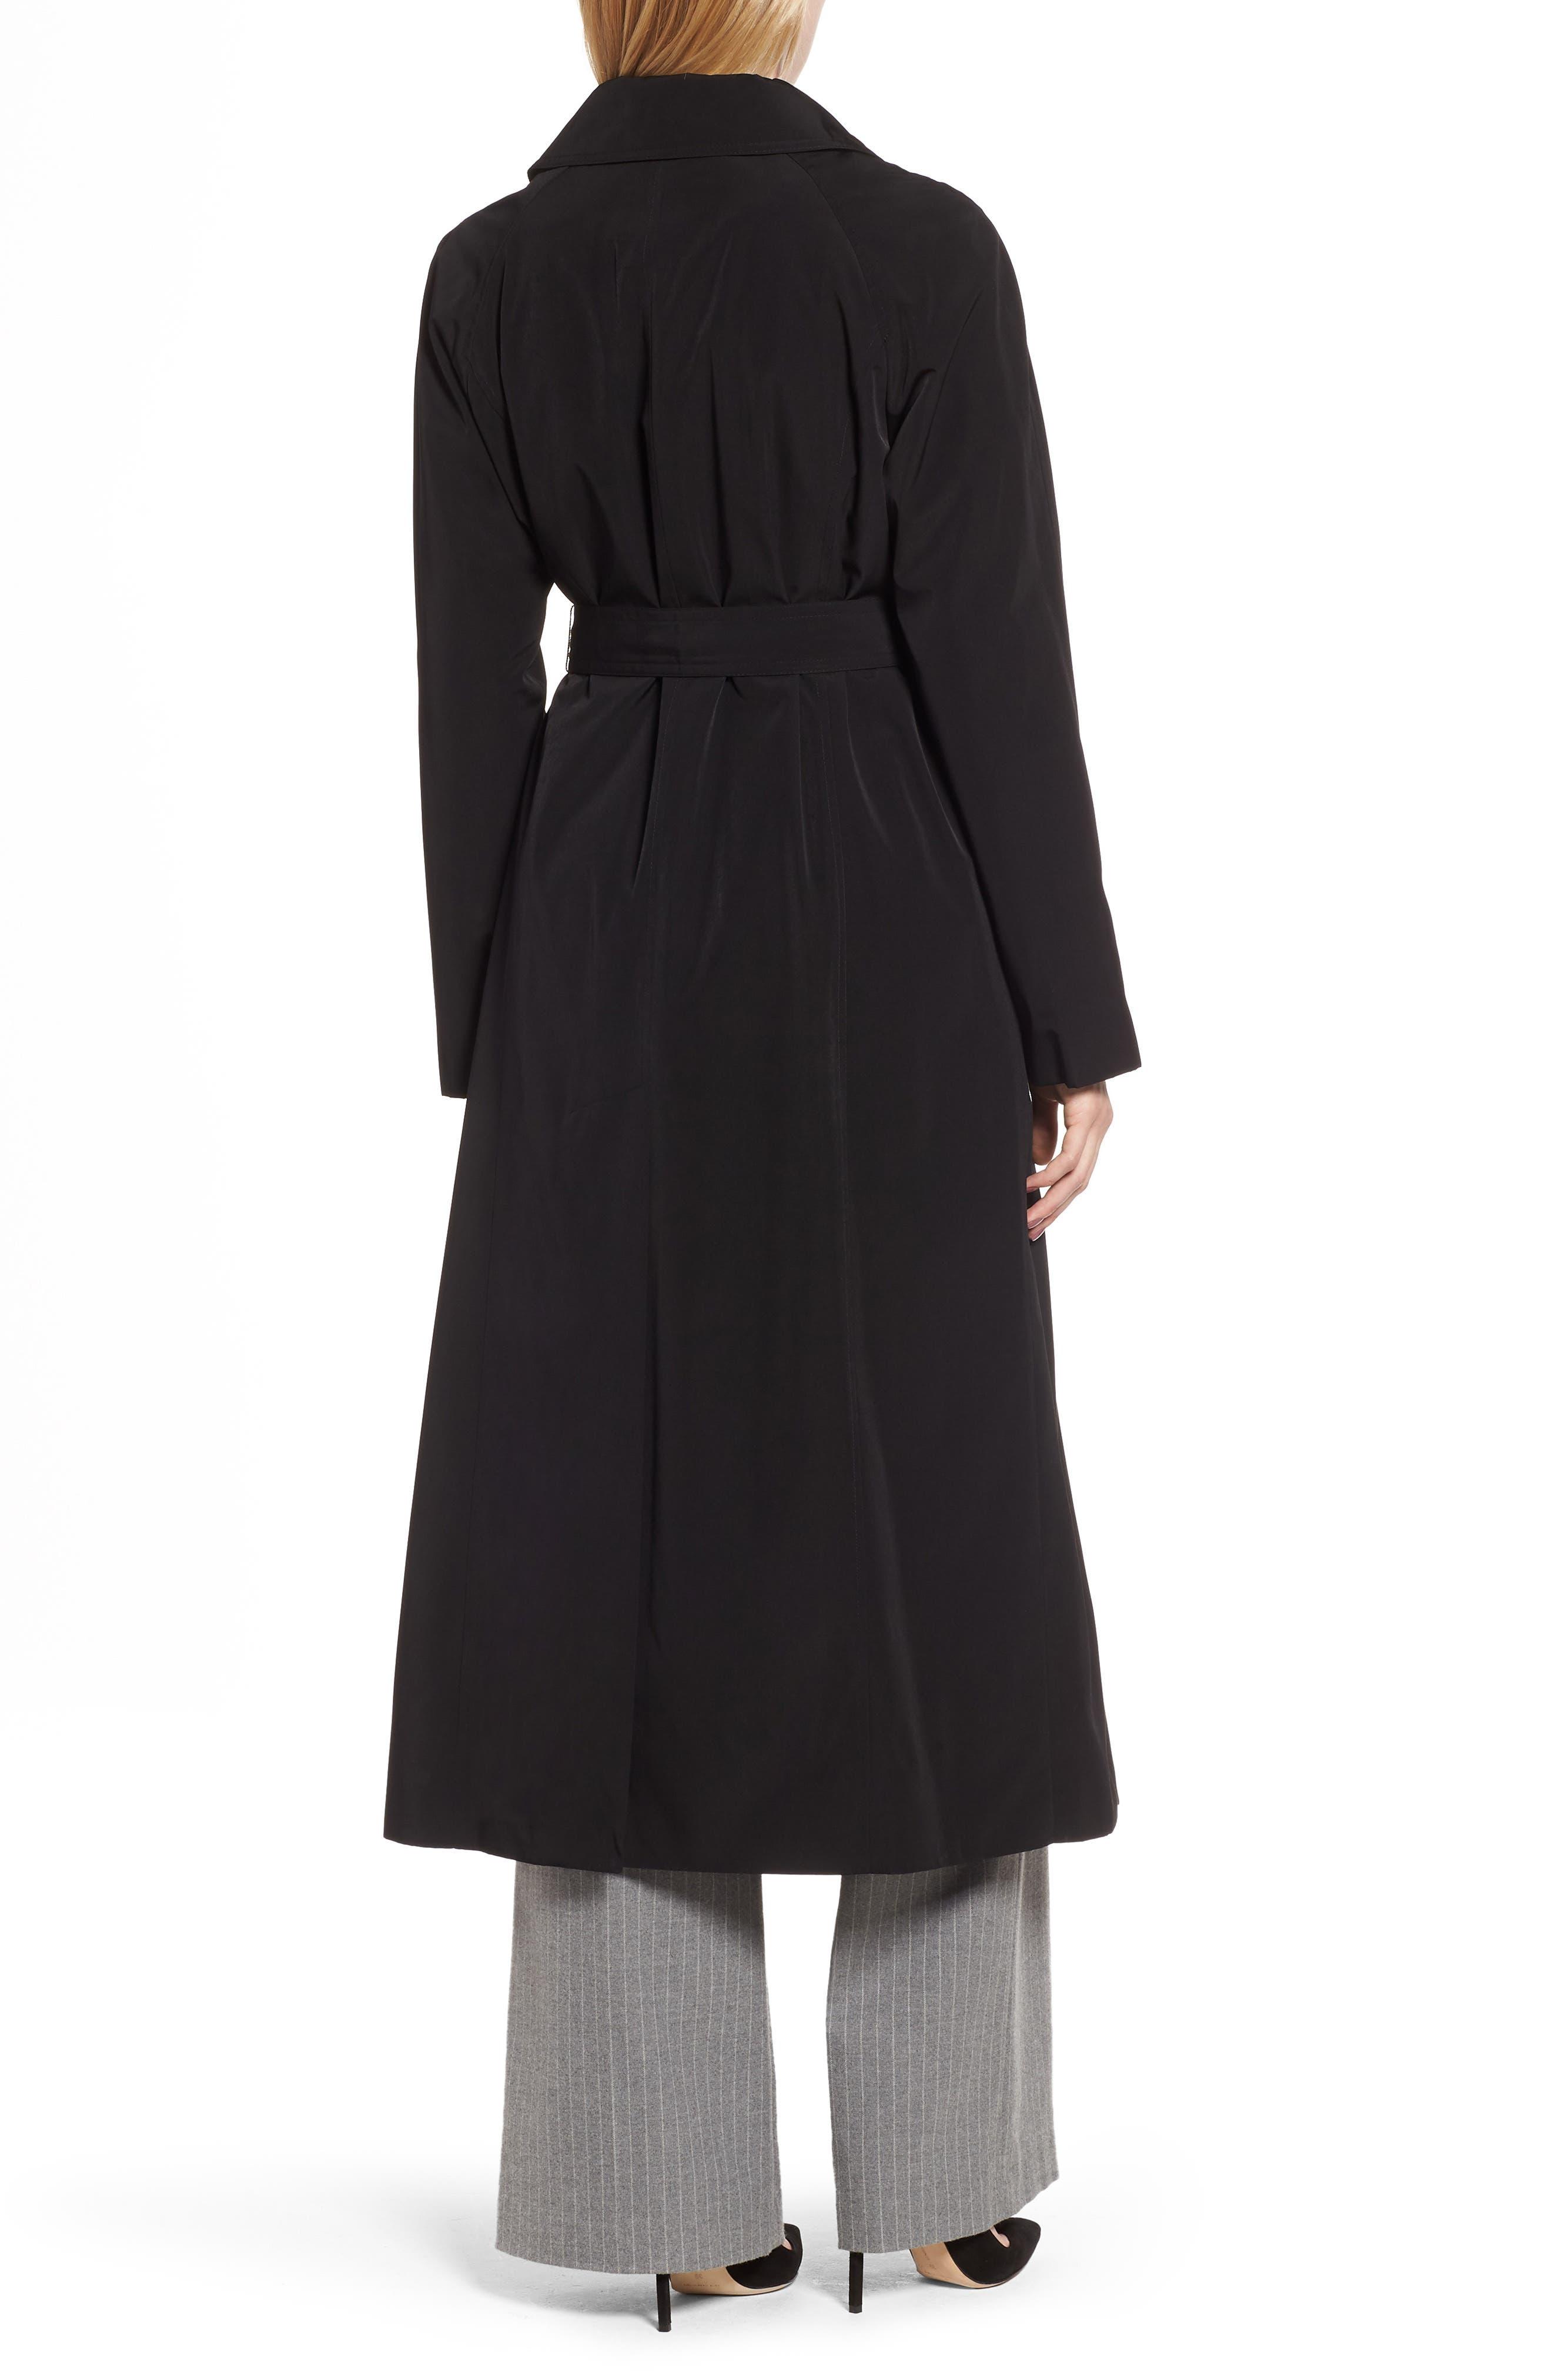 LONDON FOG, Long Trench Coat with Detachable Hood & Liner, Alternate thumbnail 2, color, BLACK